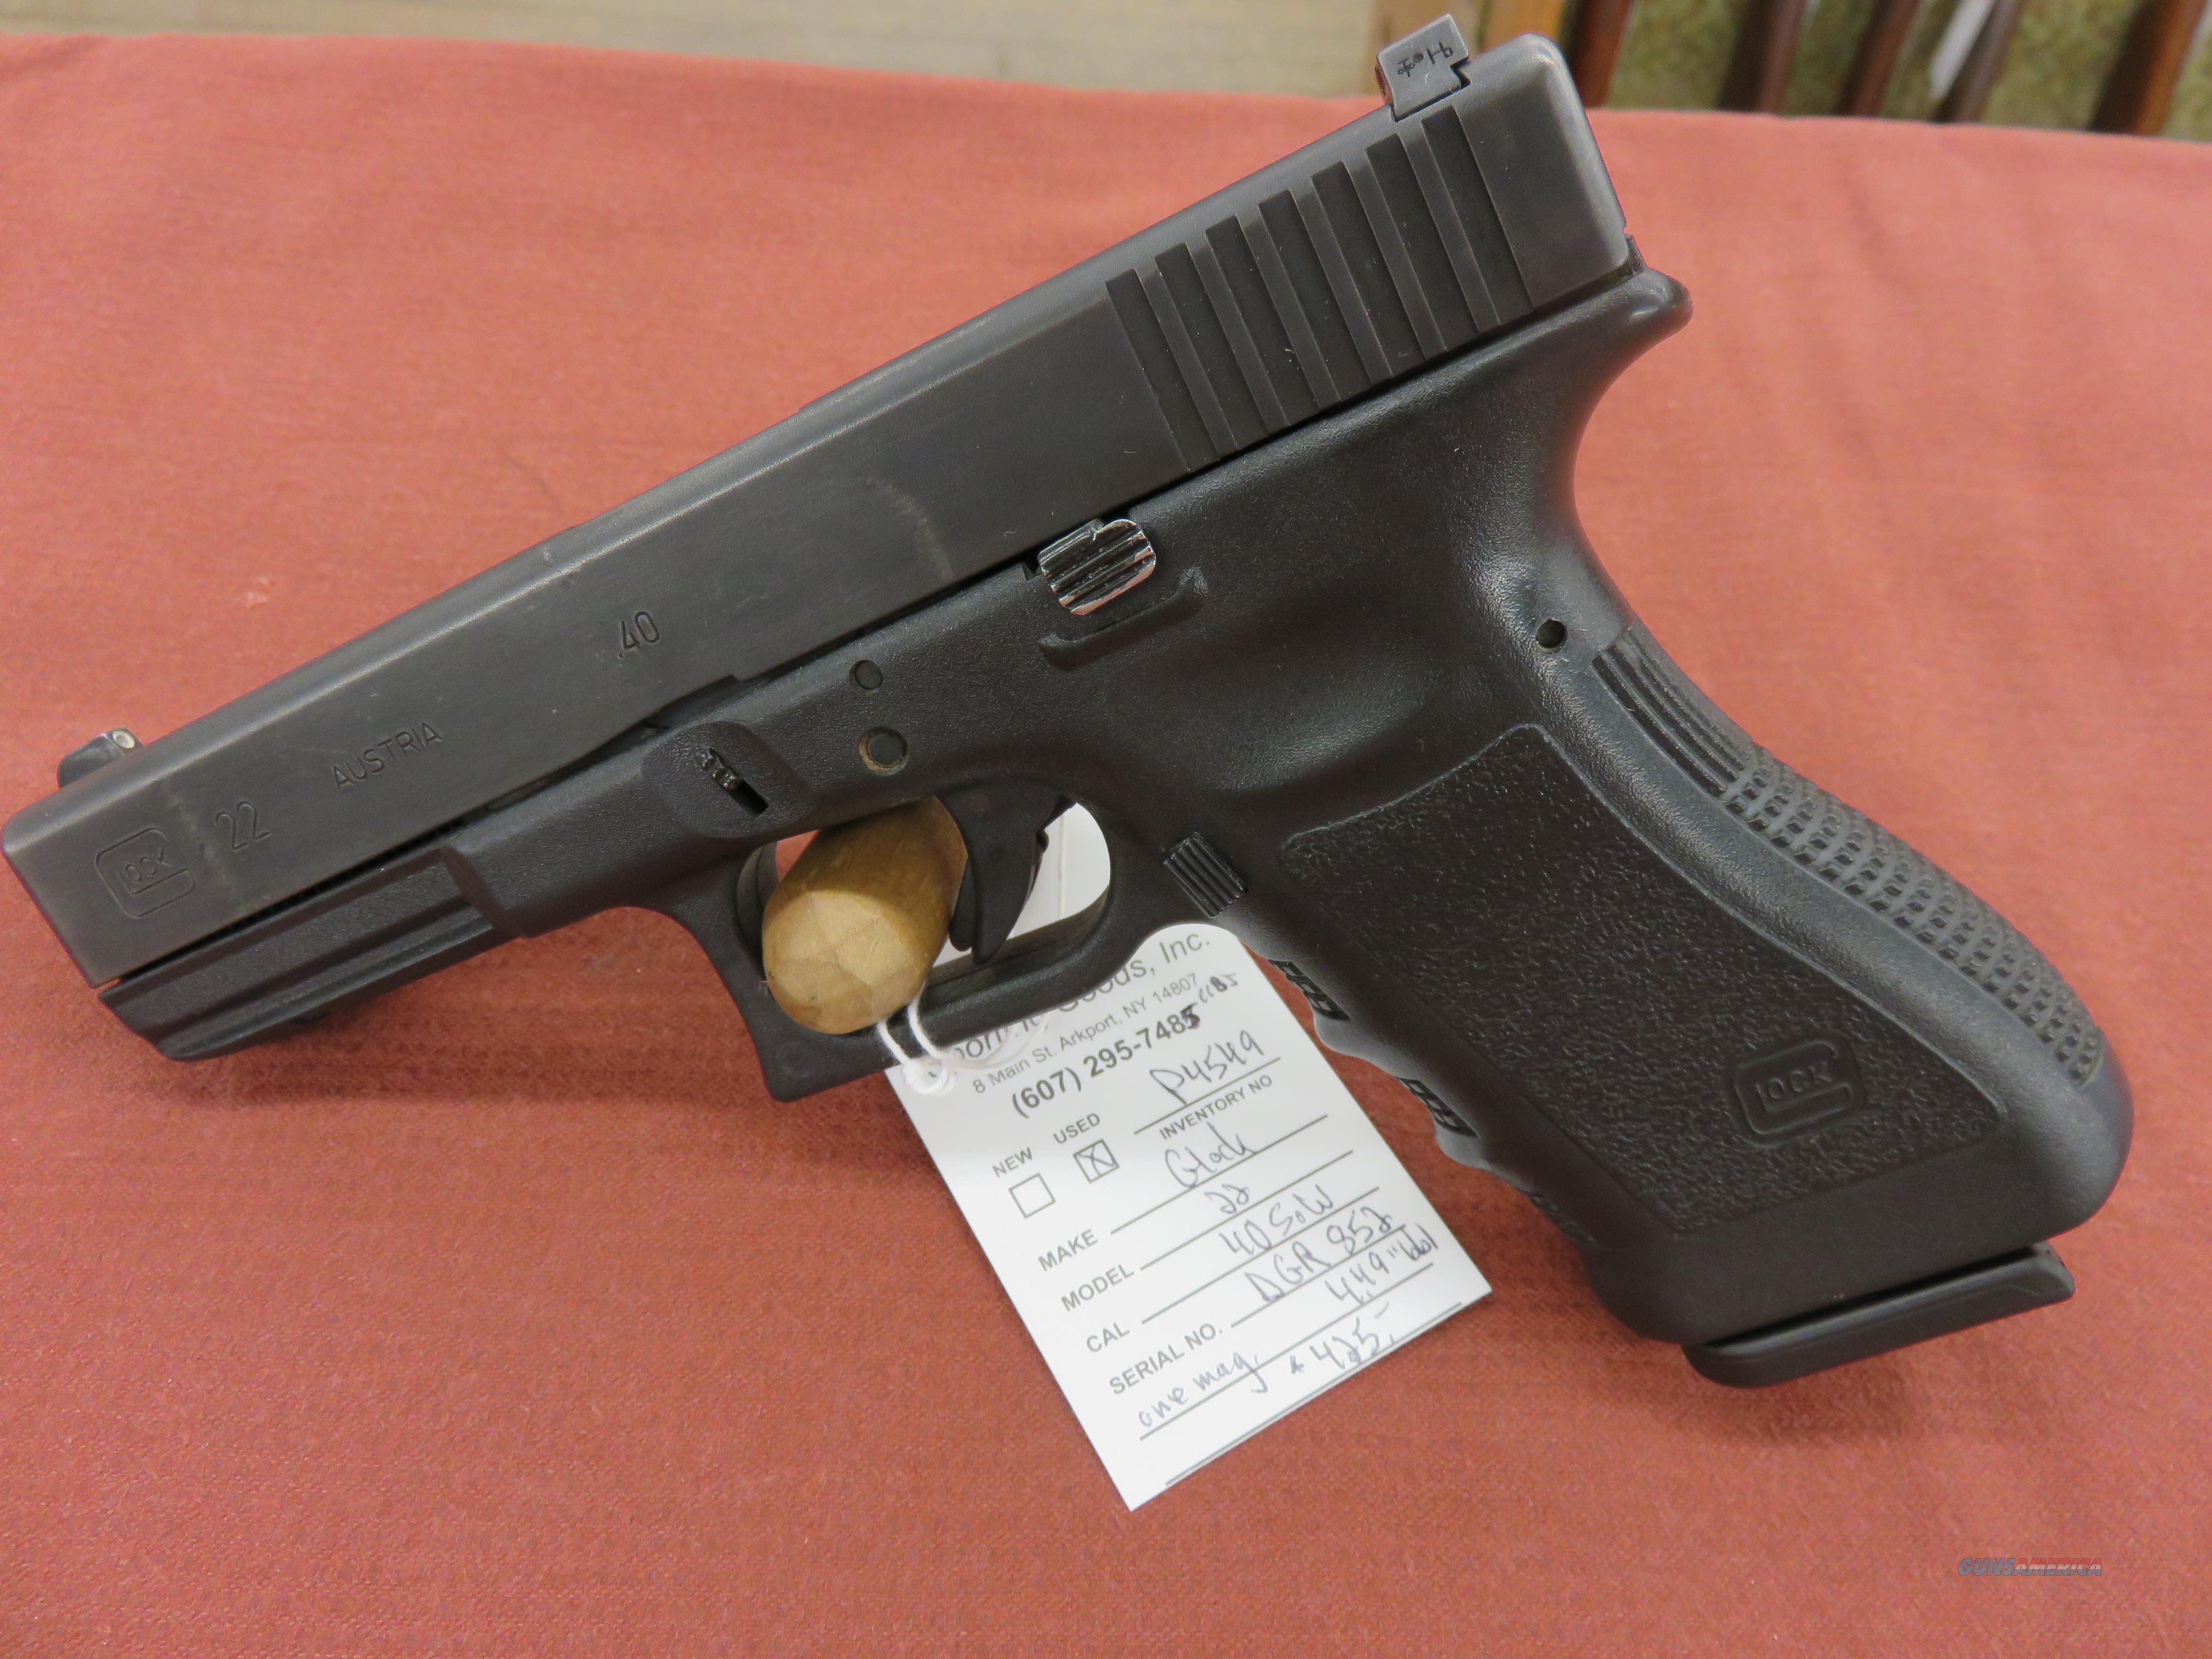 Glock 22  Guns > Pistols > Glock Pistols > 22